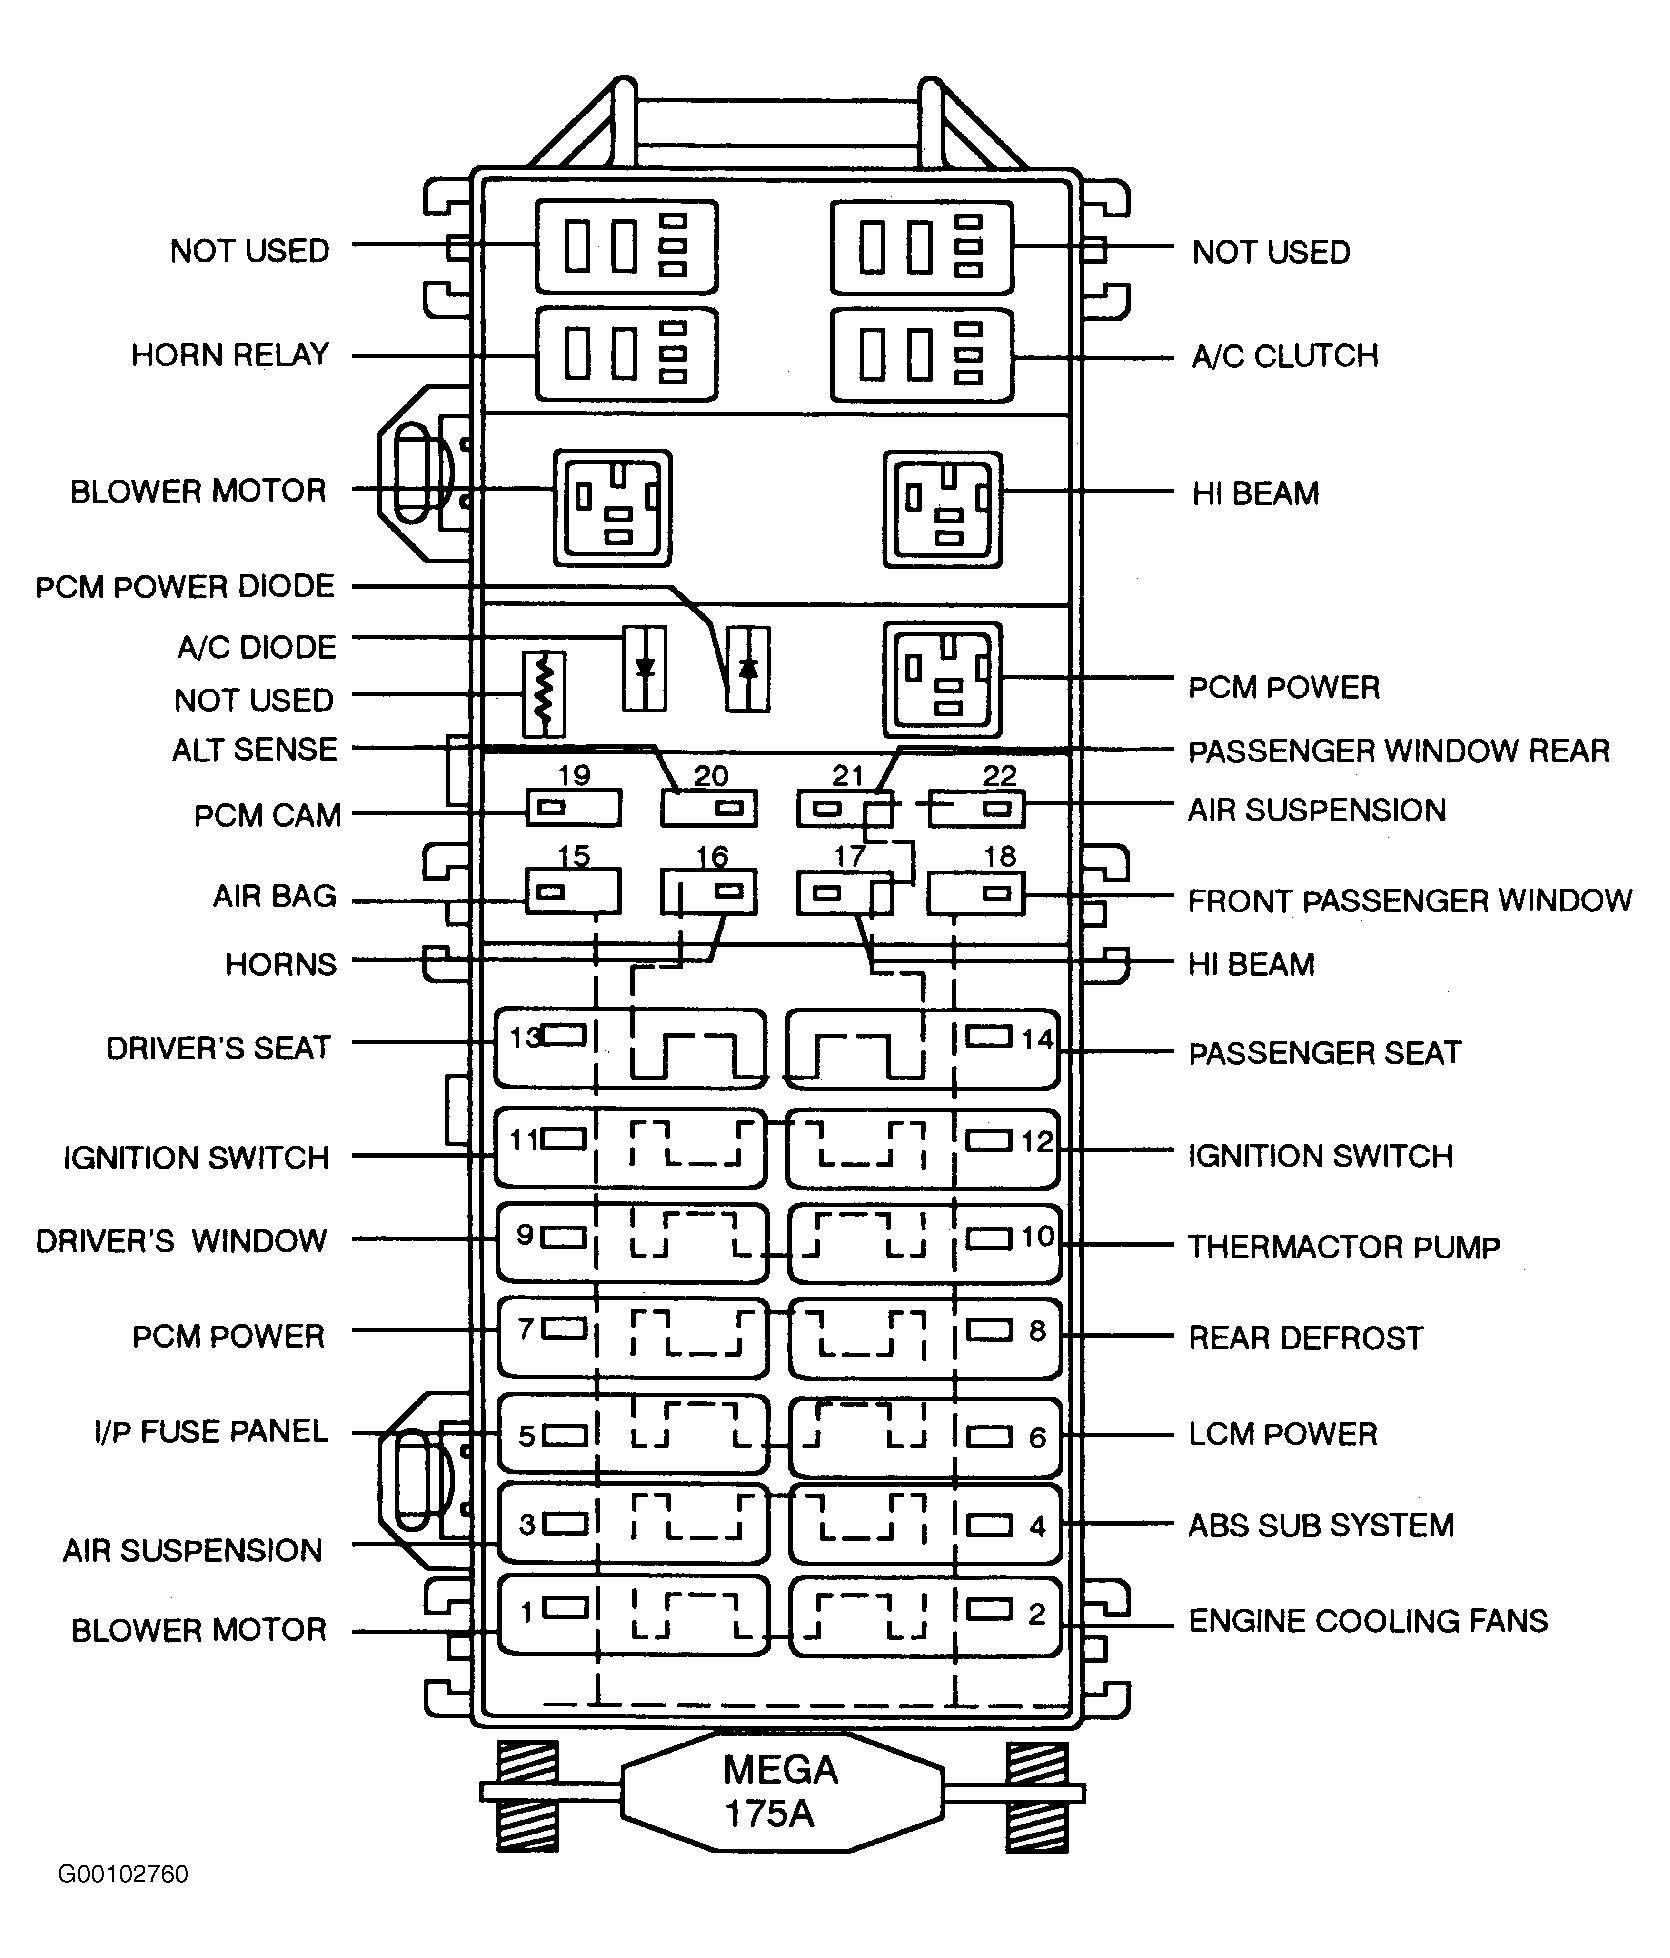 MN_4544] 2004 Lincoln Aviator Engine Diagram Download DiagramInkl Reda Cosm Isra Mohammedshrine Librar Wiring 101